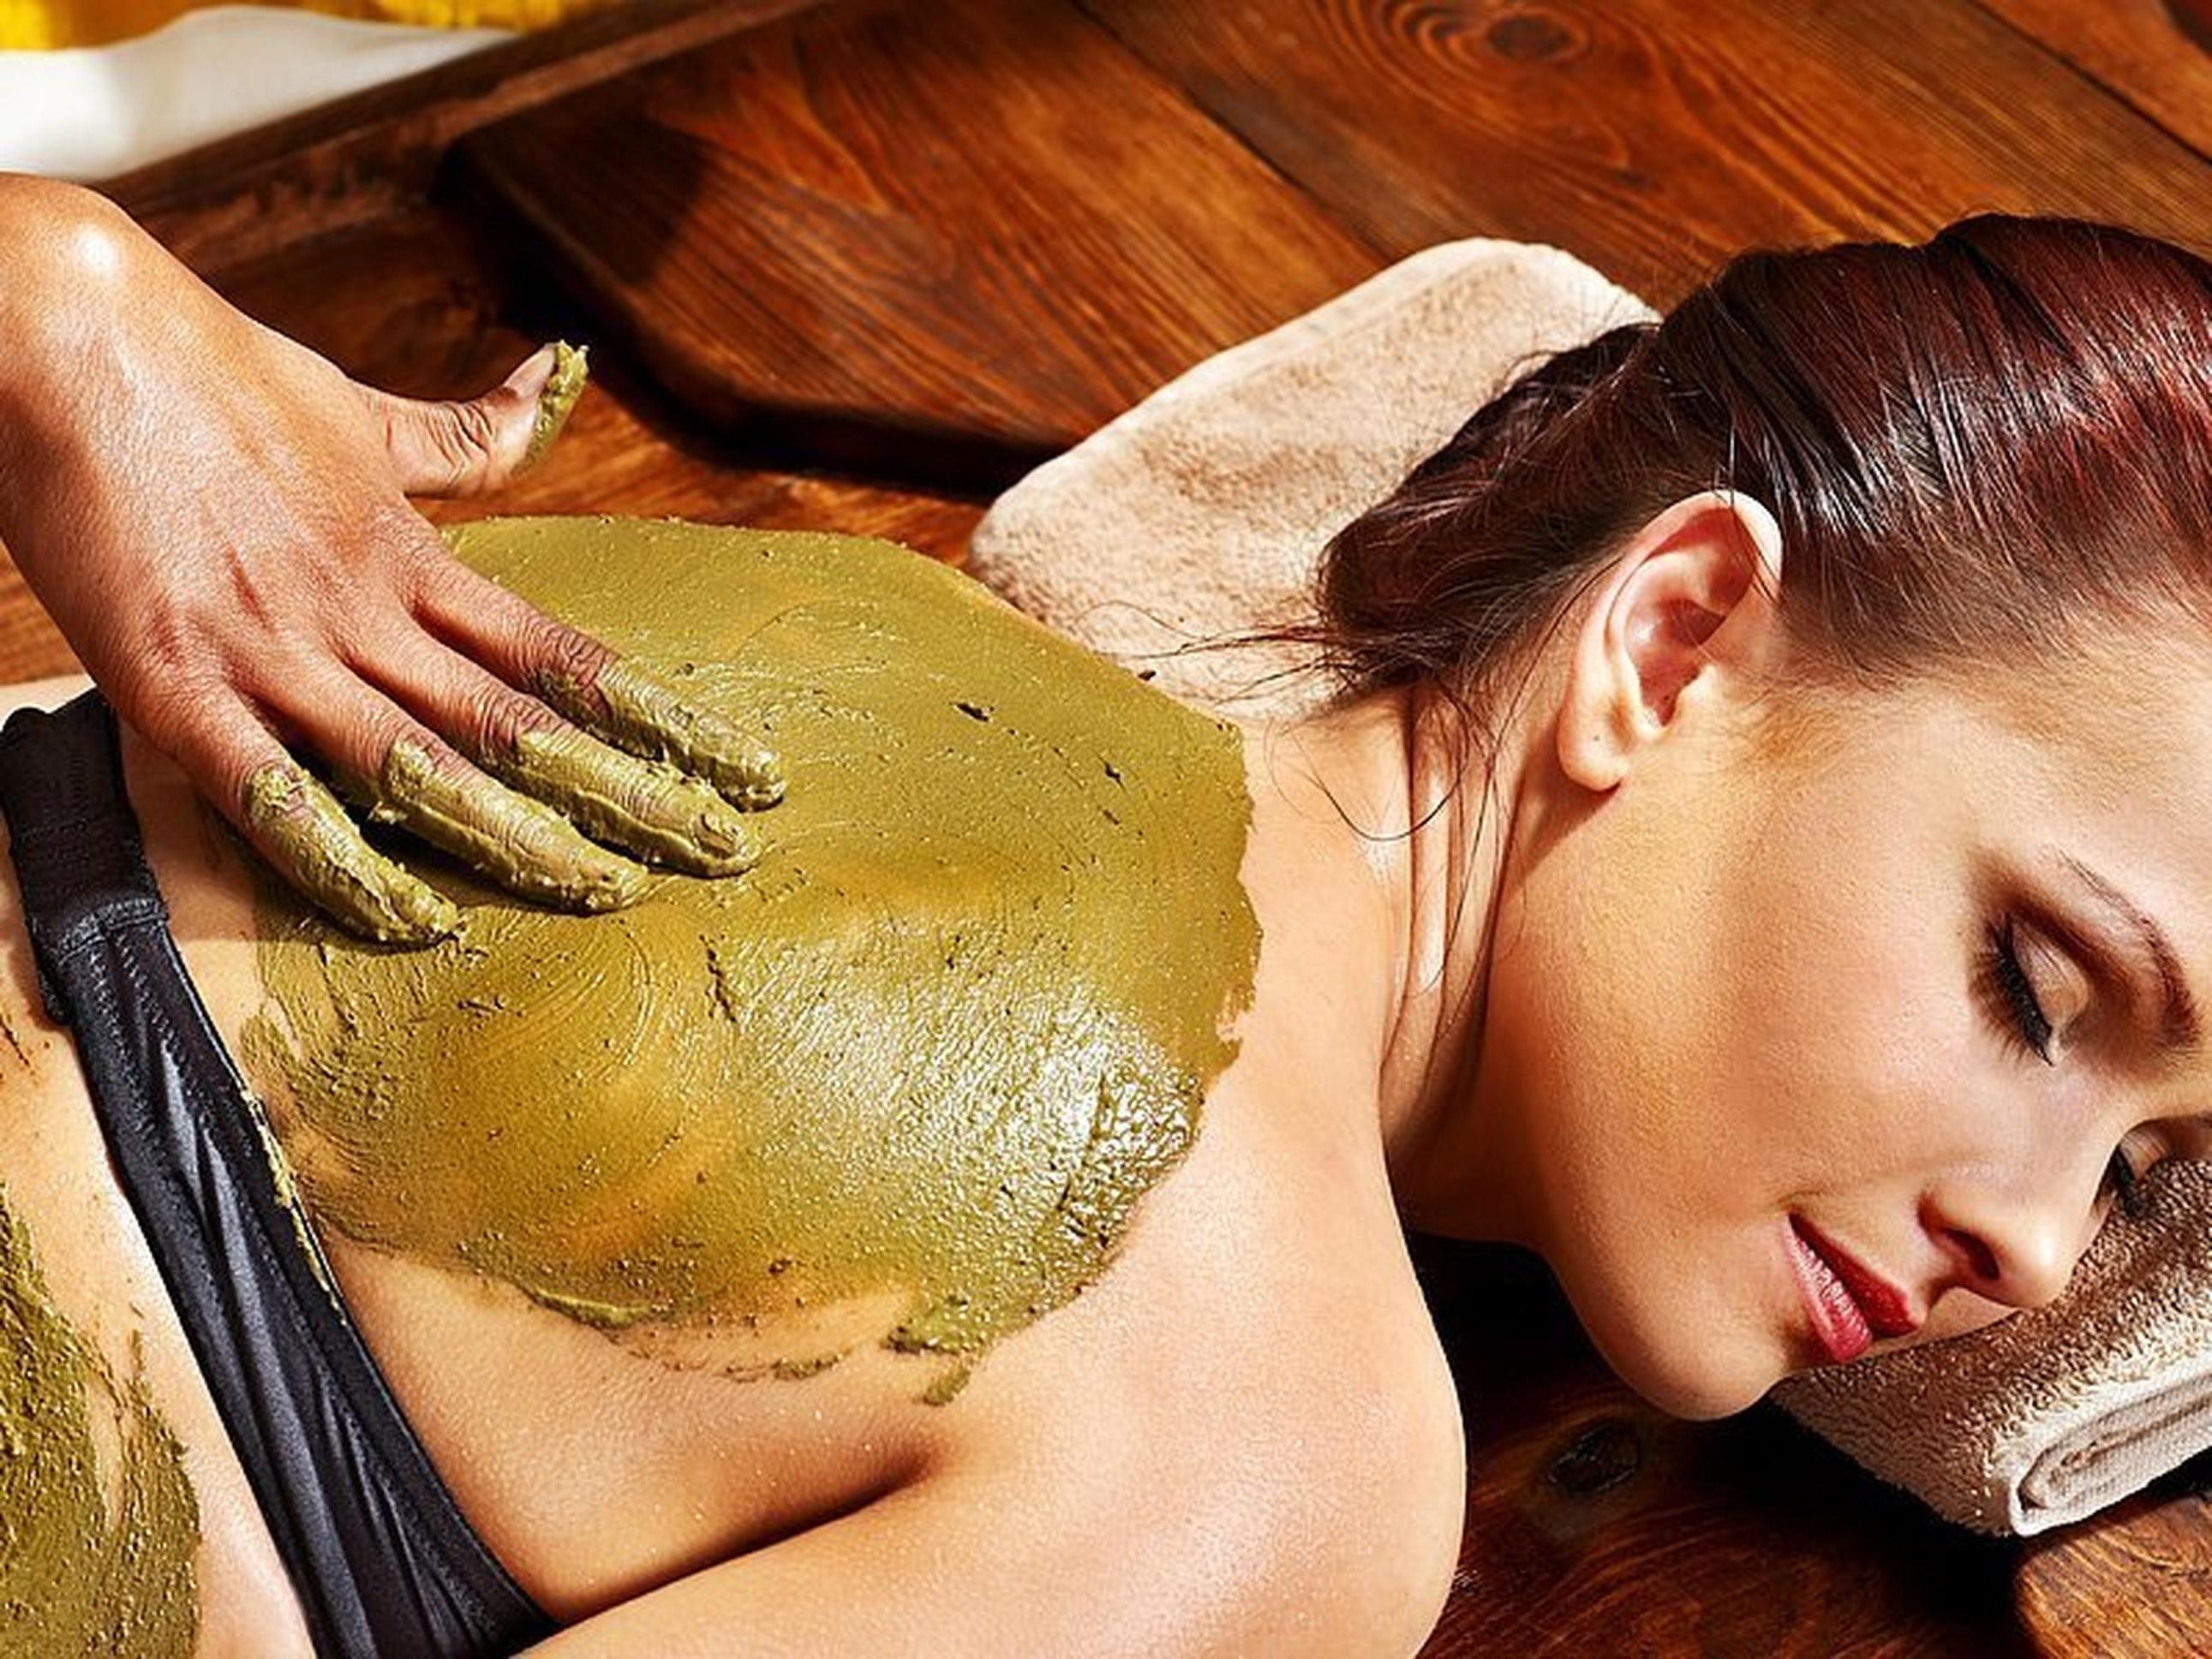 A lady undergoing Ayurveda massage